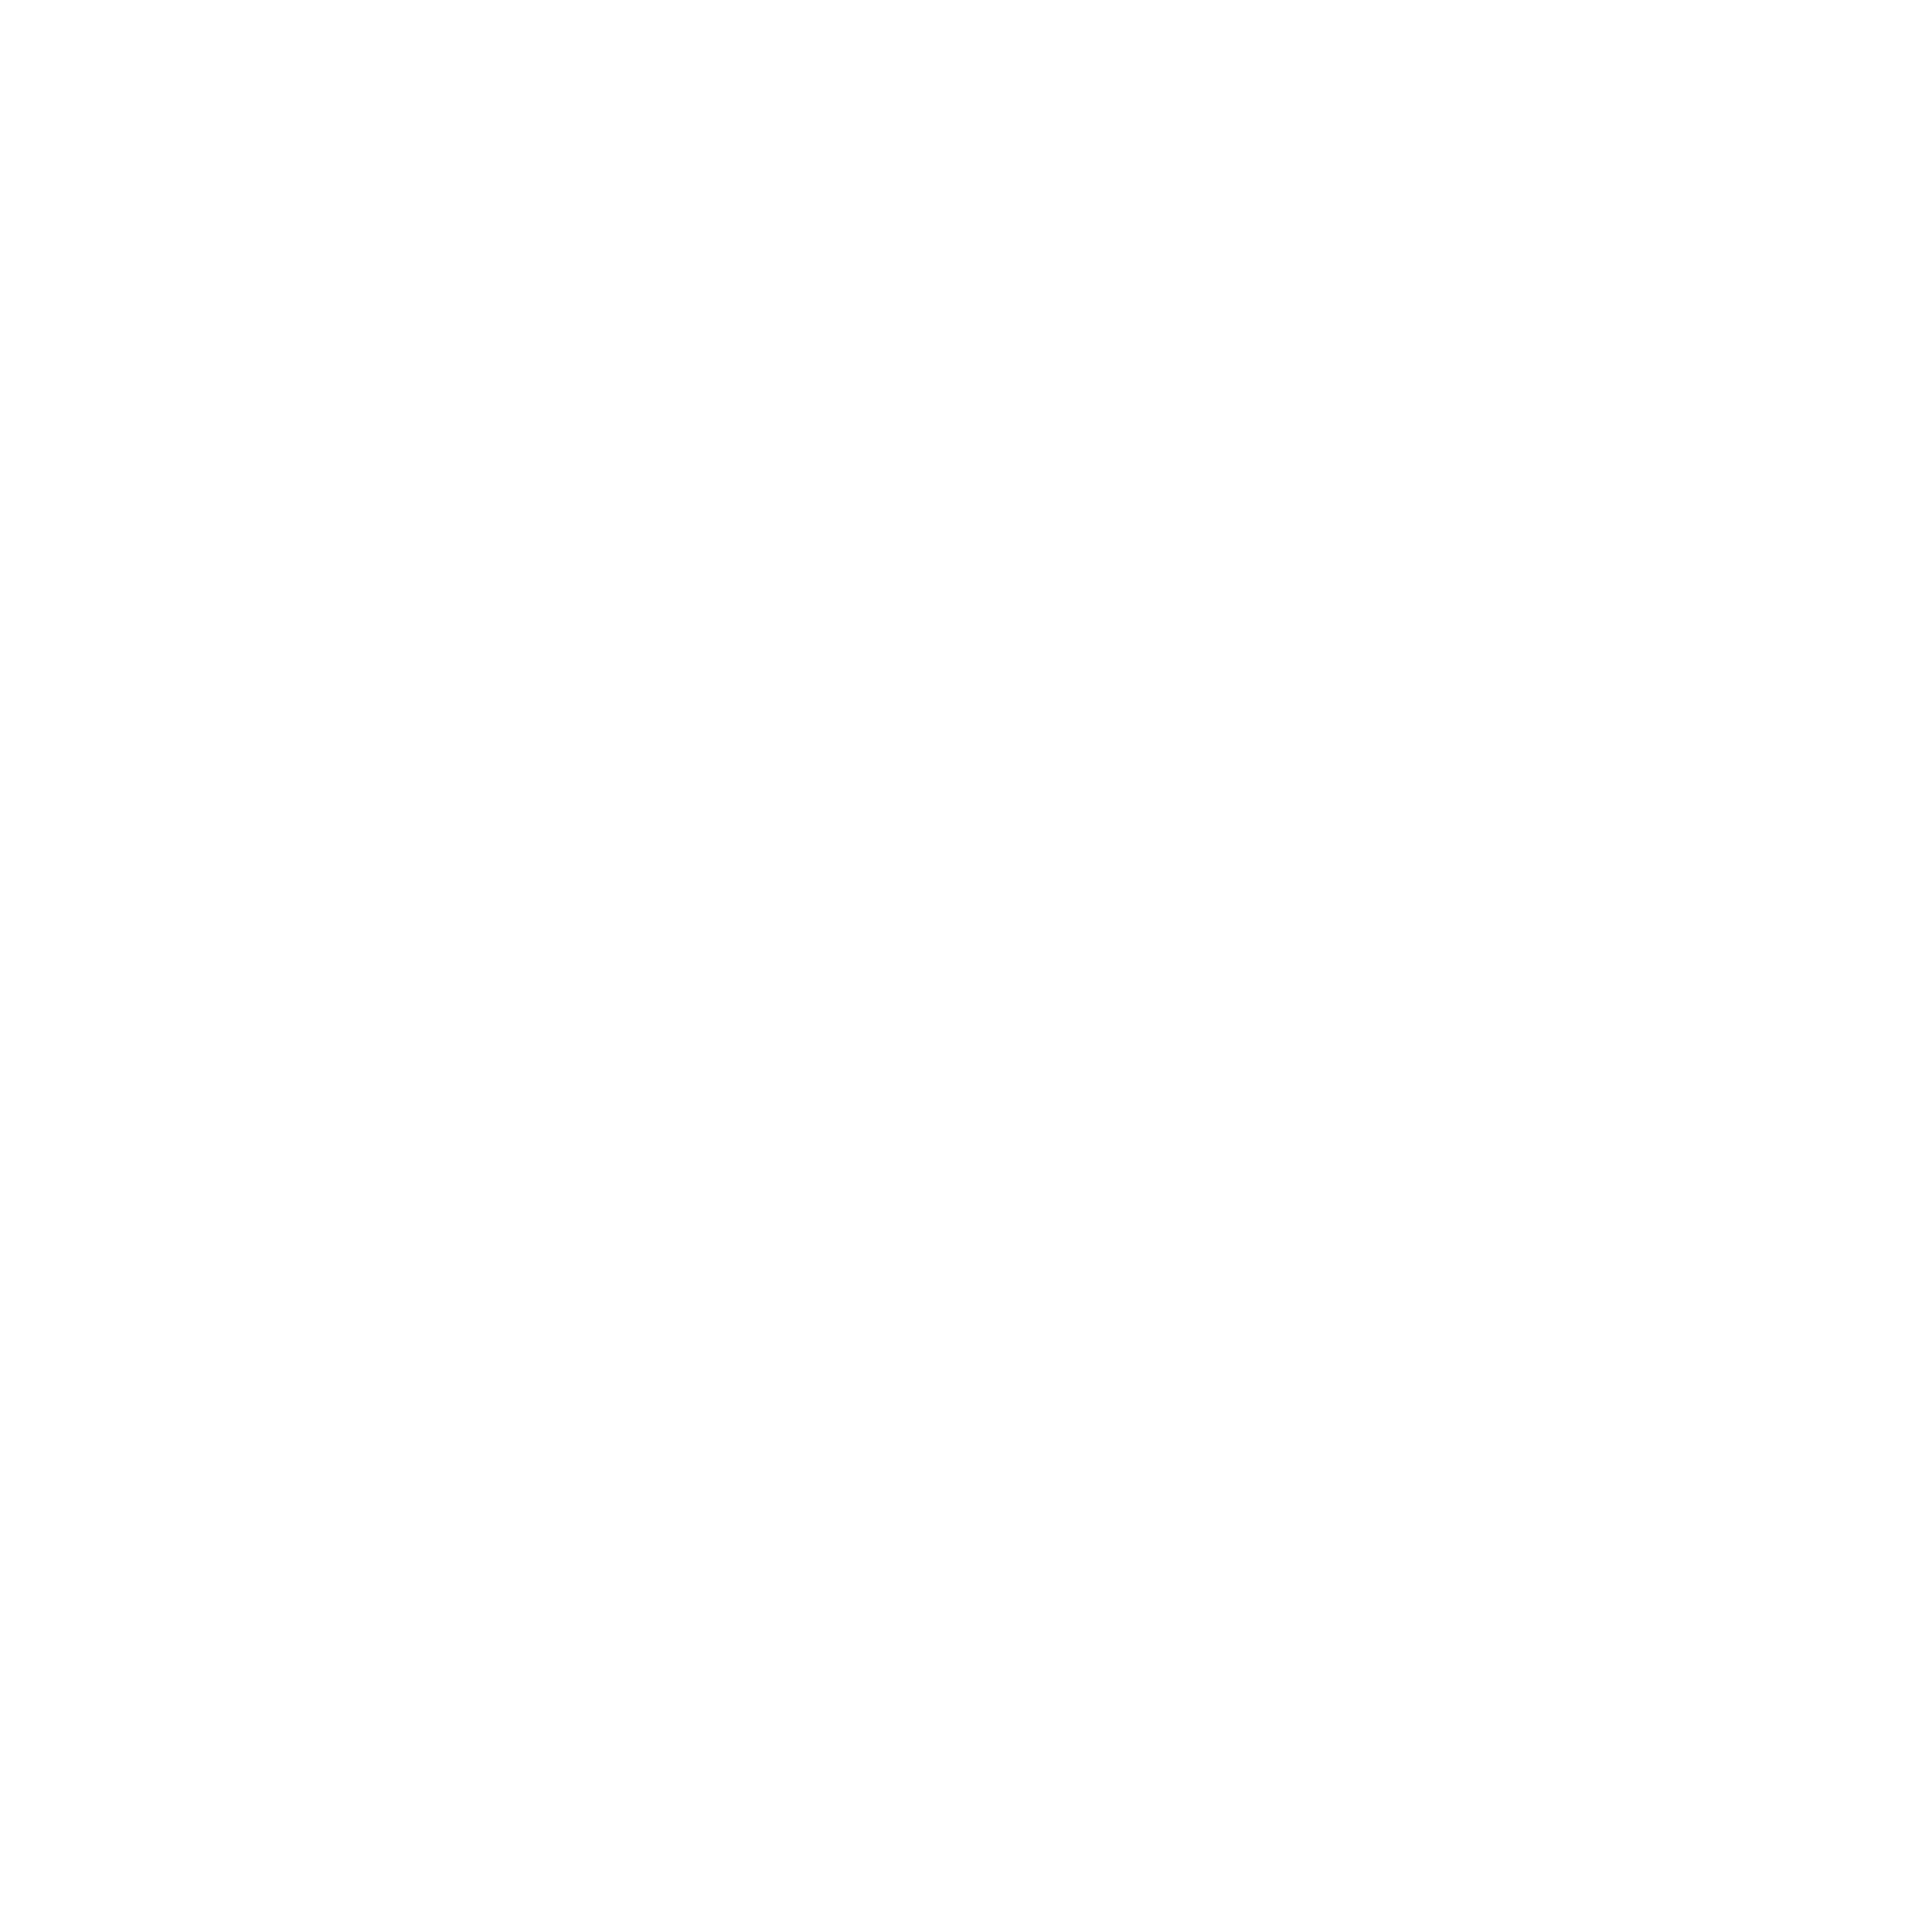 ADP-22S